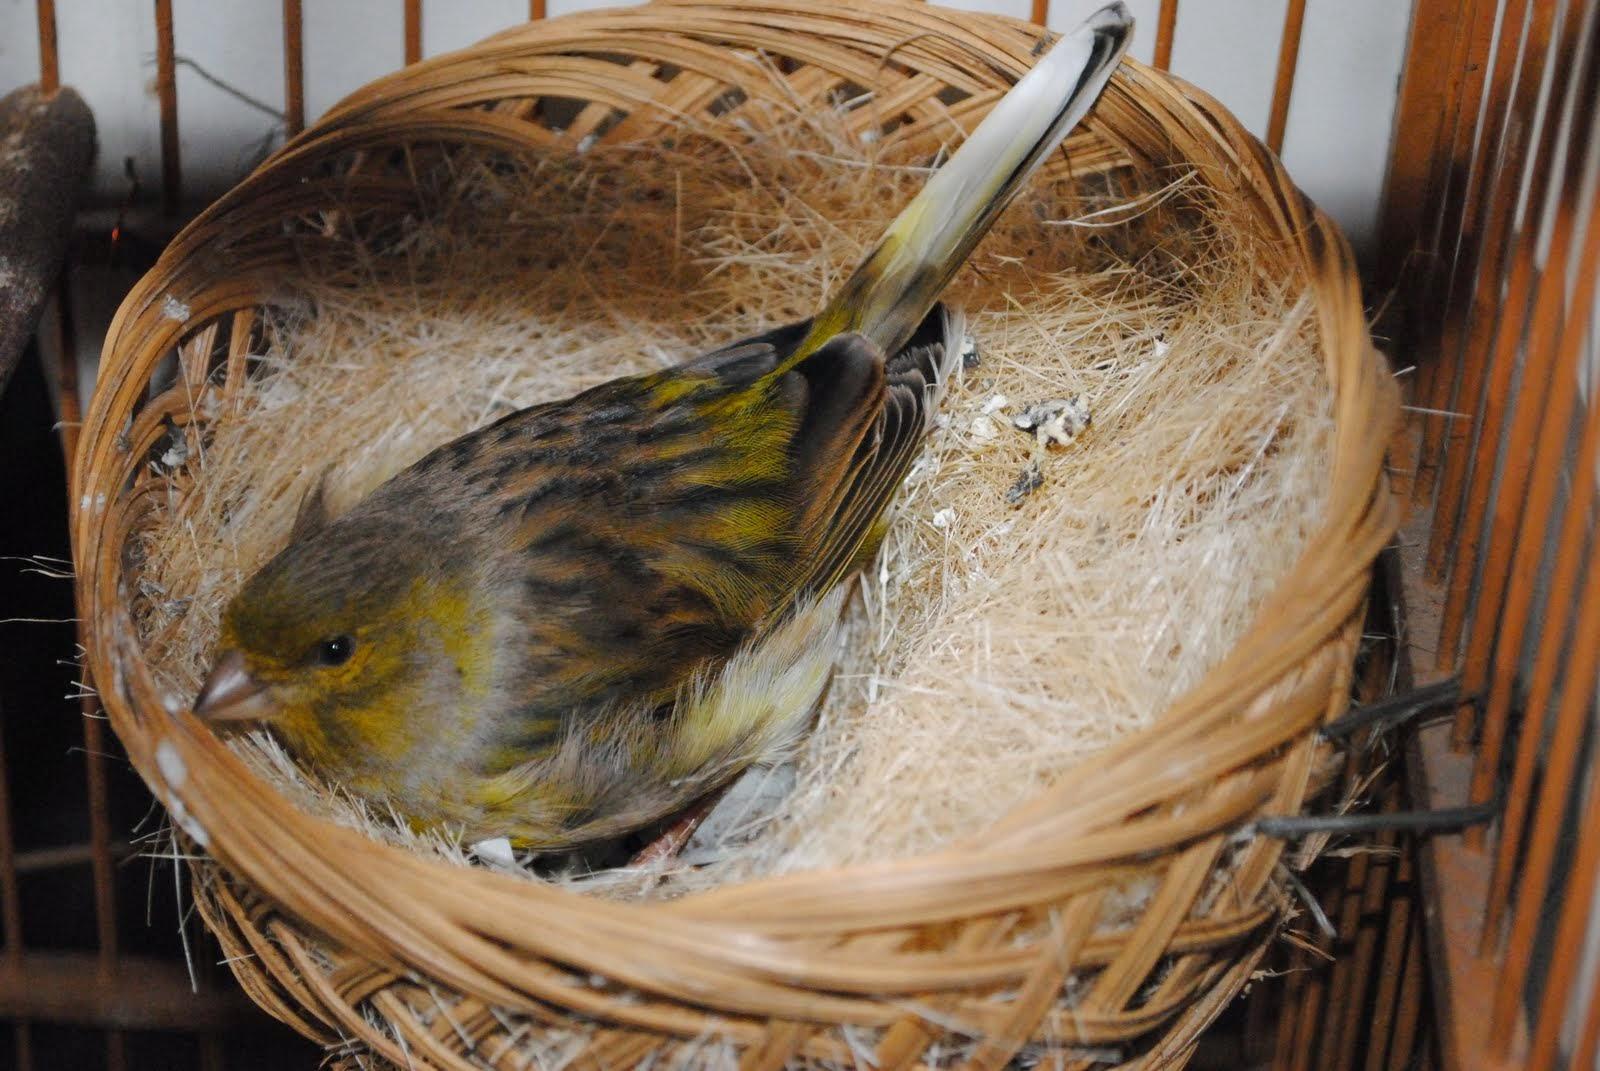 Lankah Lankah Berternak Burung Kenari Cara Berternak Kenari Dengan Baik